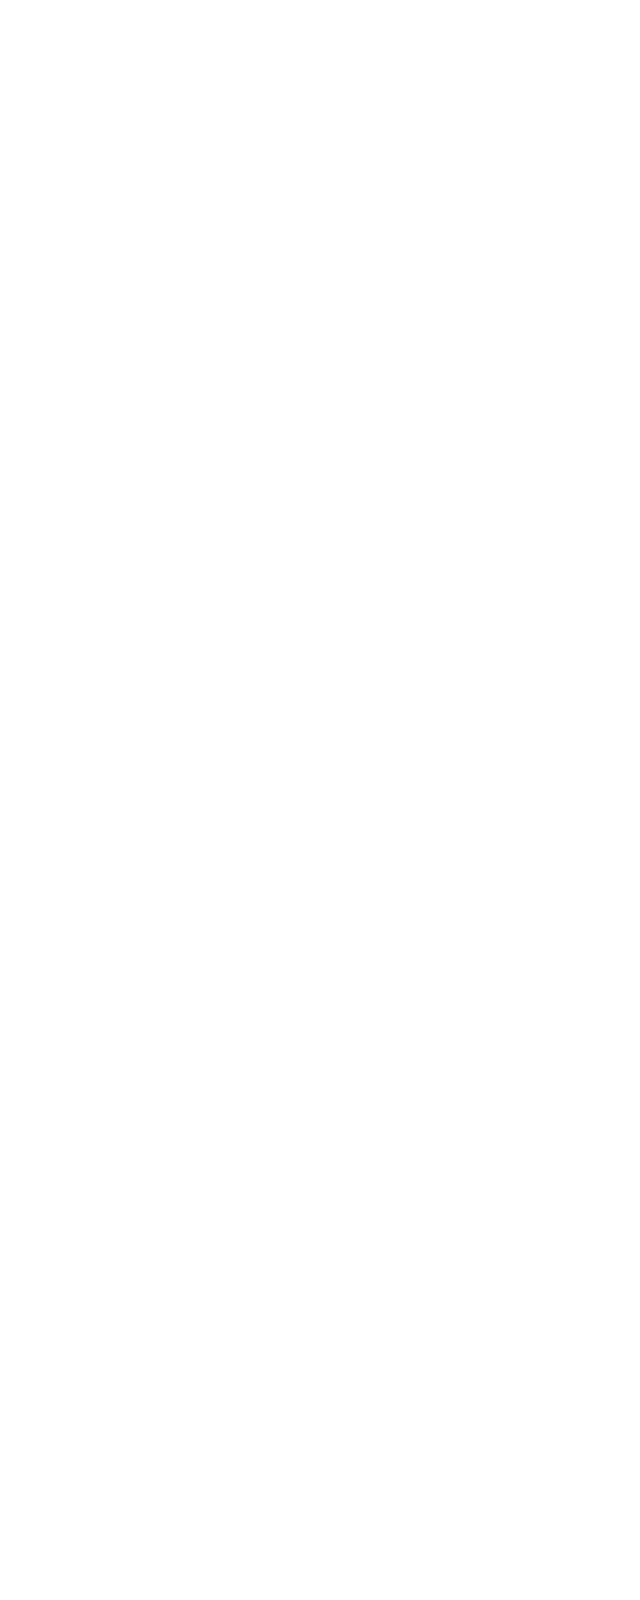 Original Horizon 受け継がれし絆 特設サイト 白猫プロジェクト